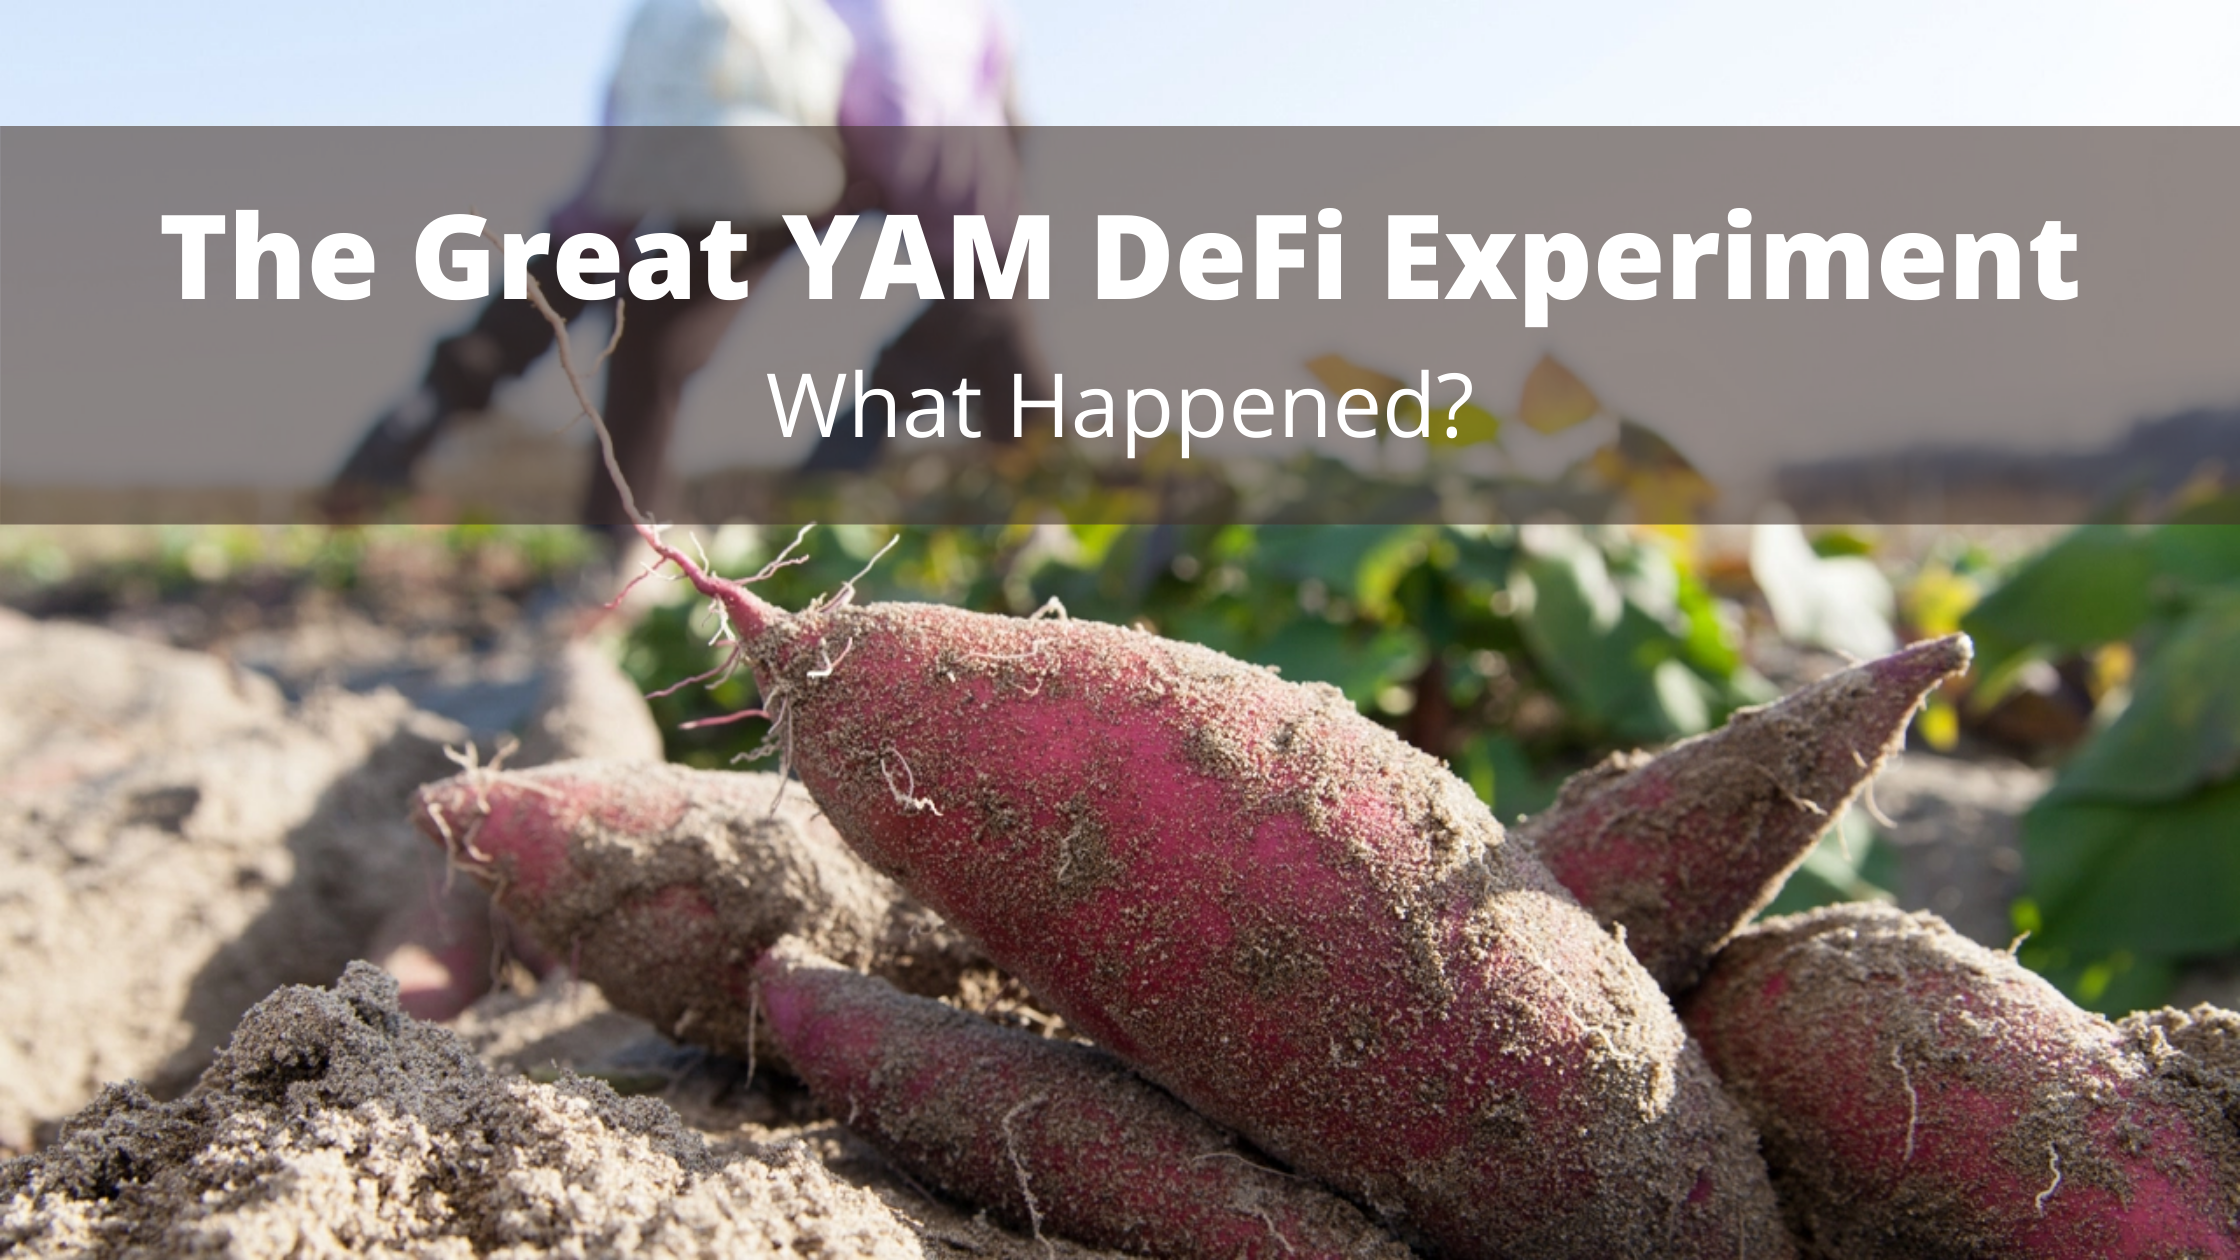 YAM DeFi Experiment